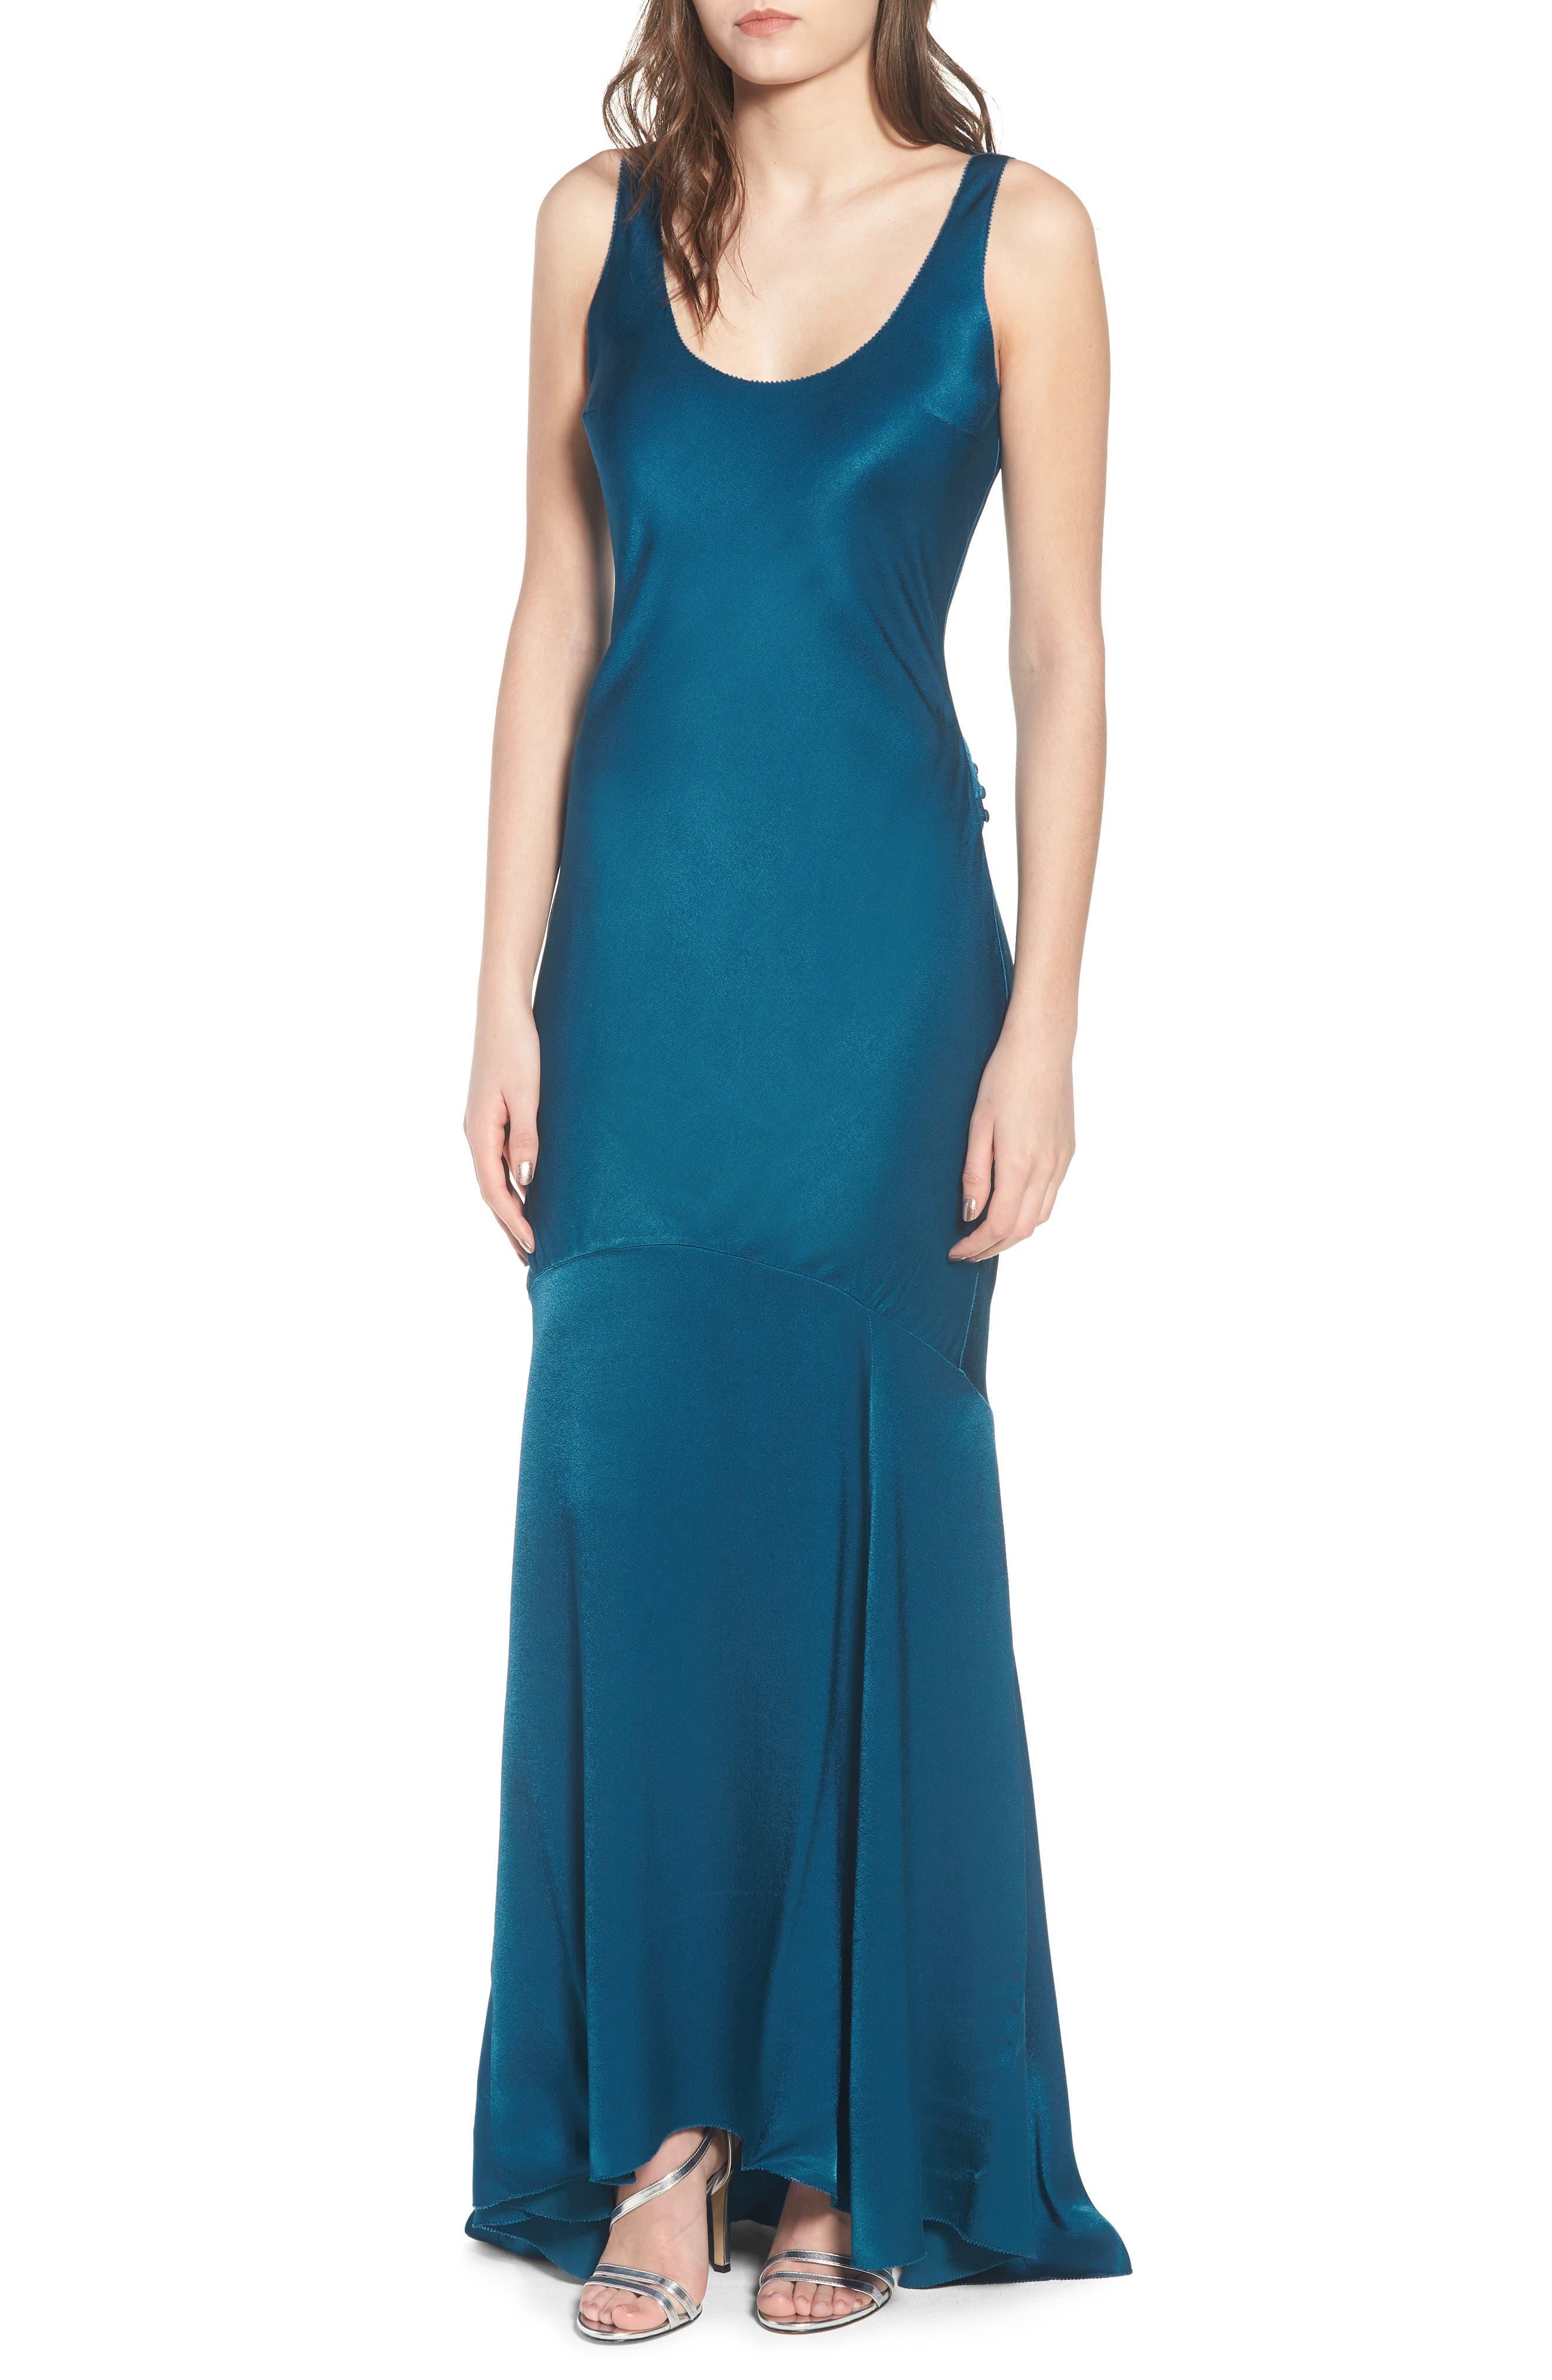 Green 2018 Prom Dresses | Nordstrom